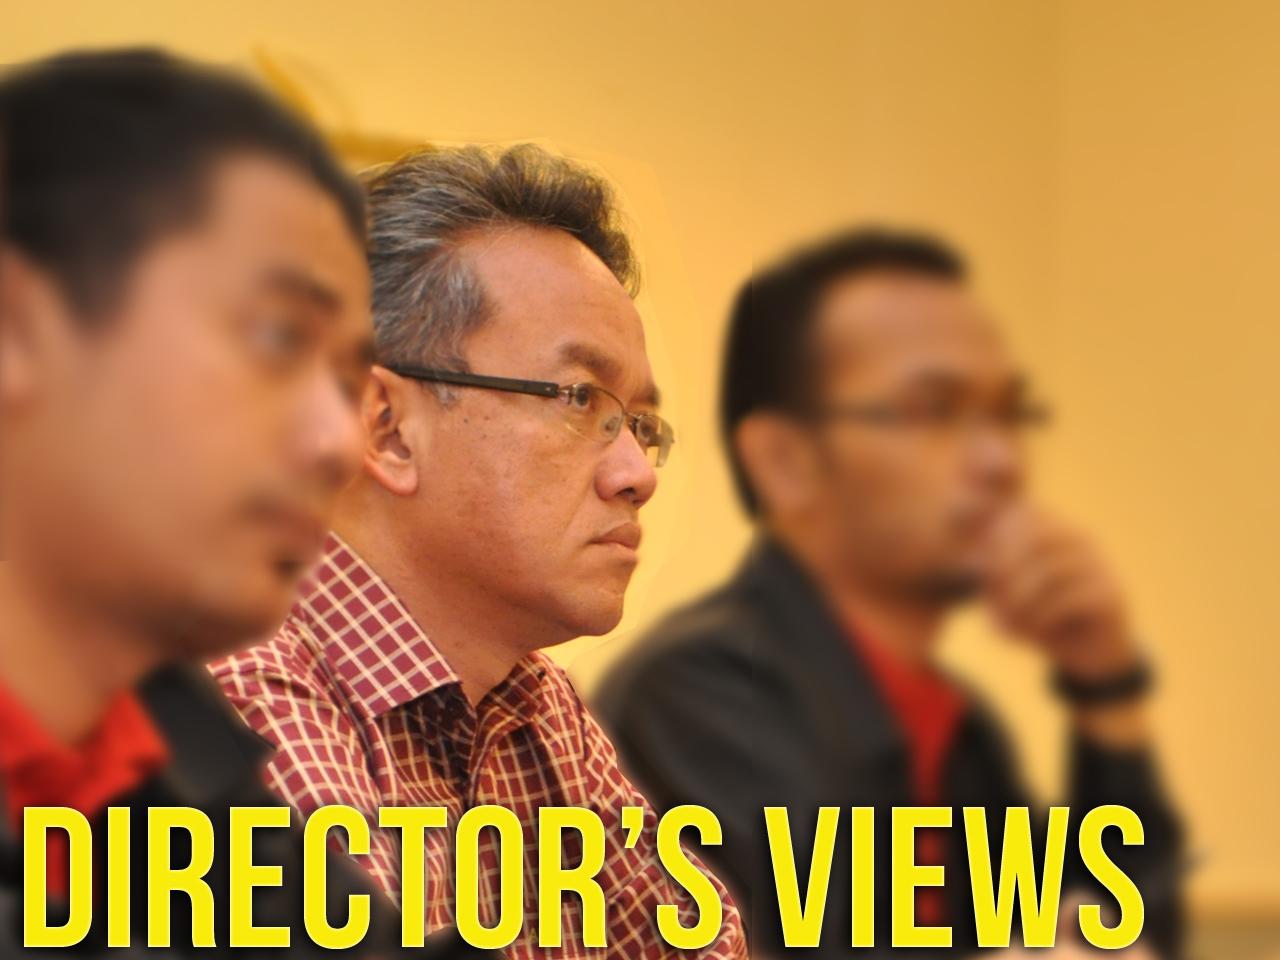 Director Views